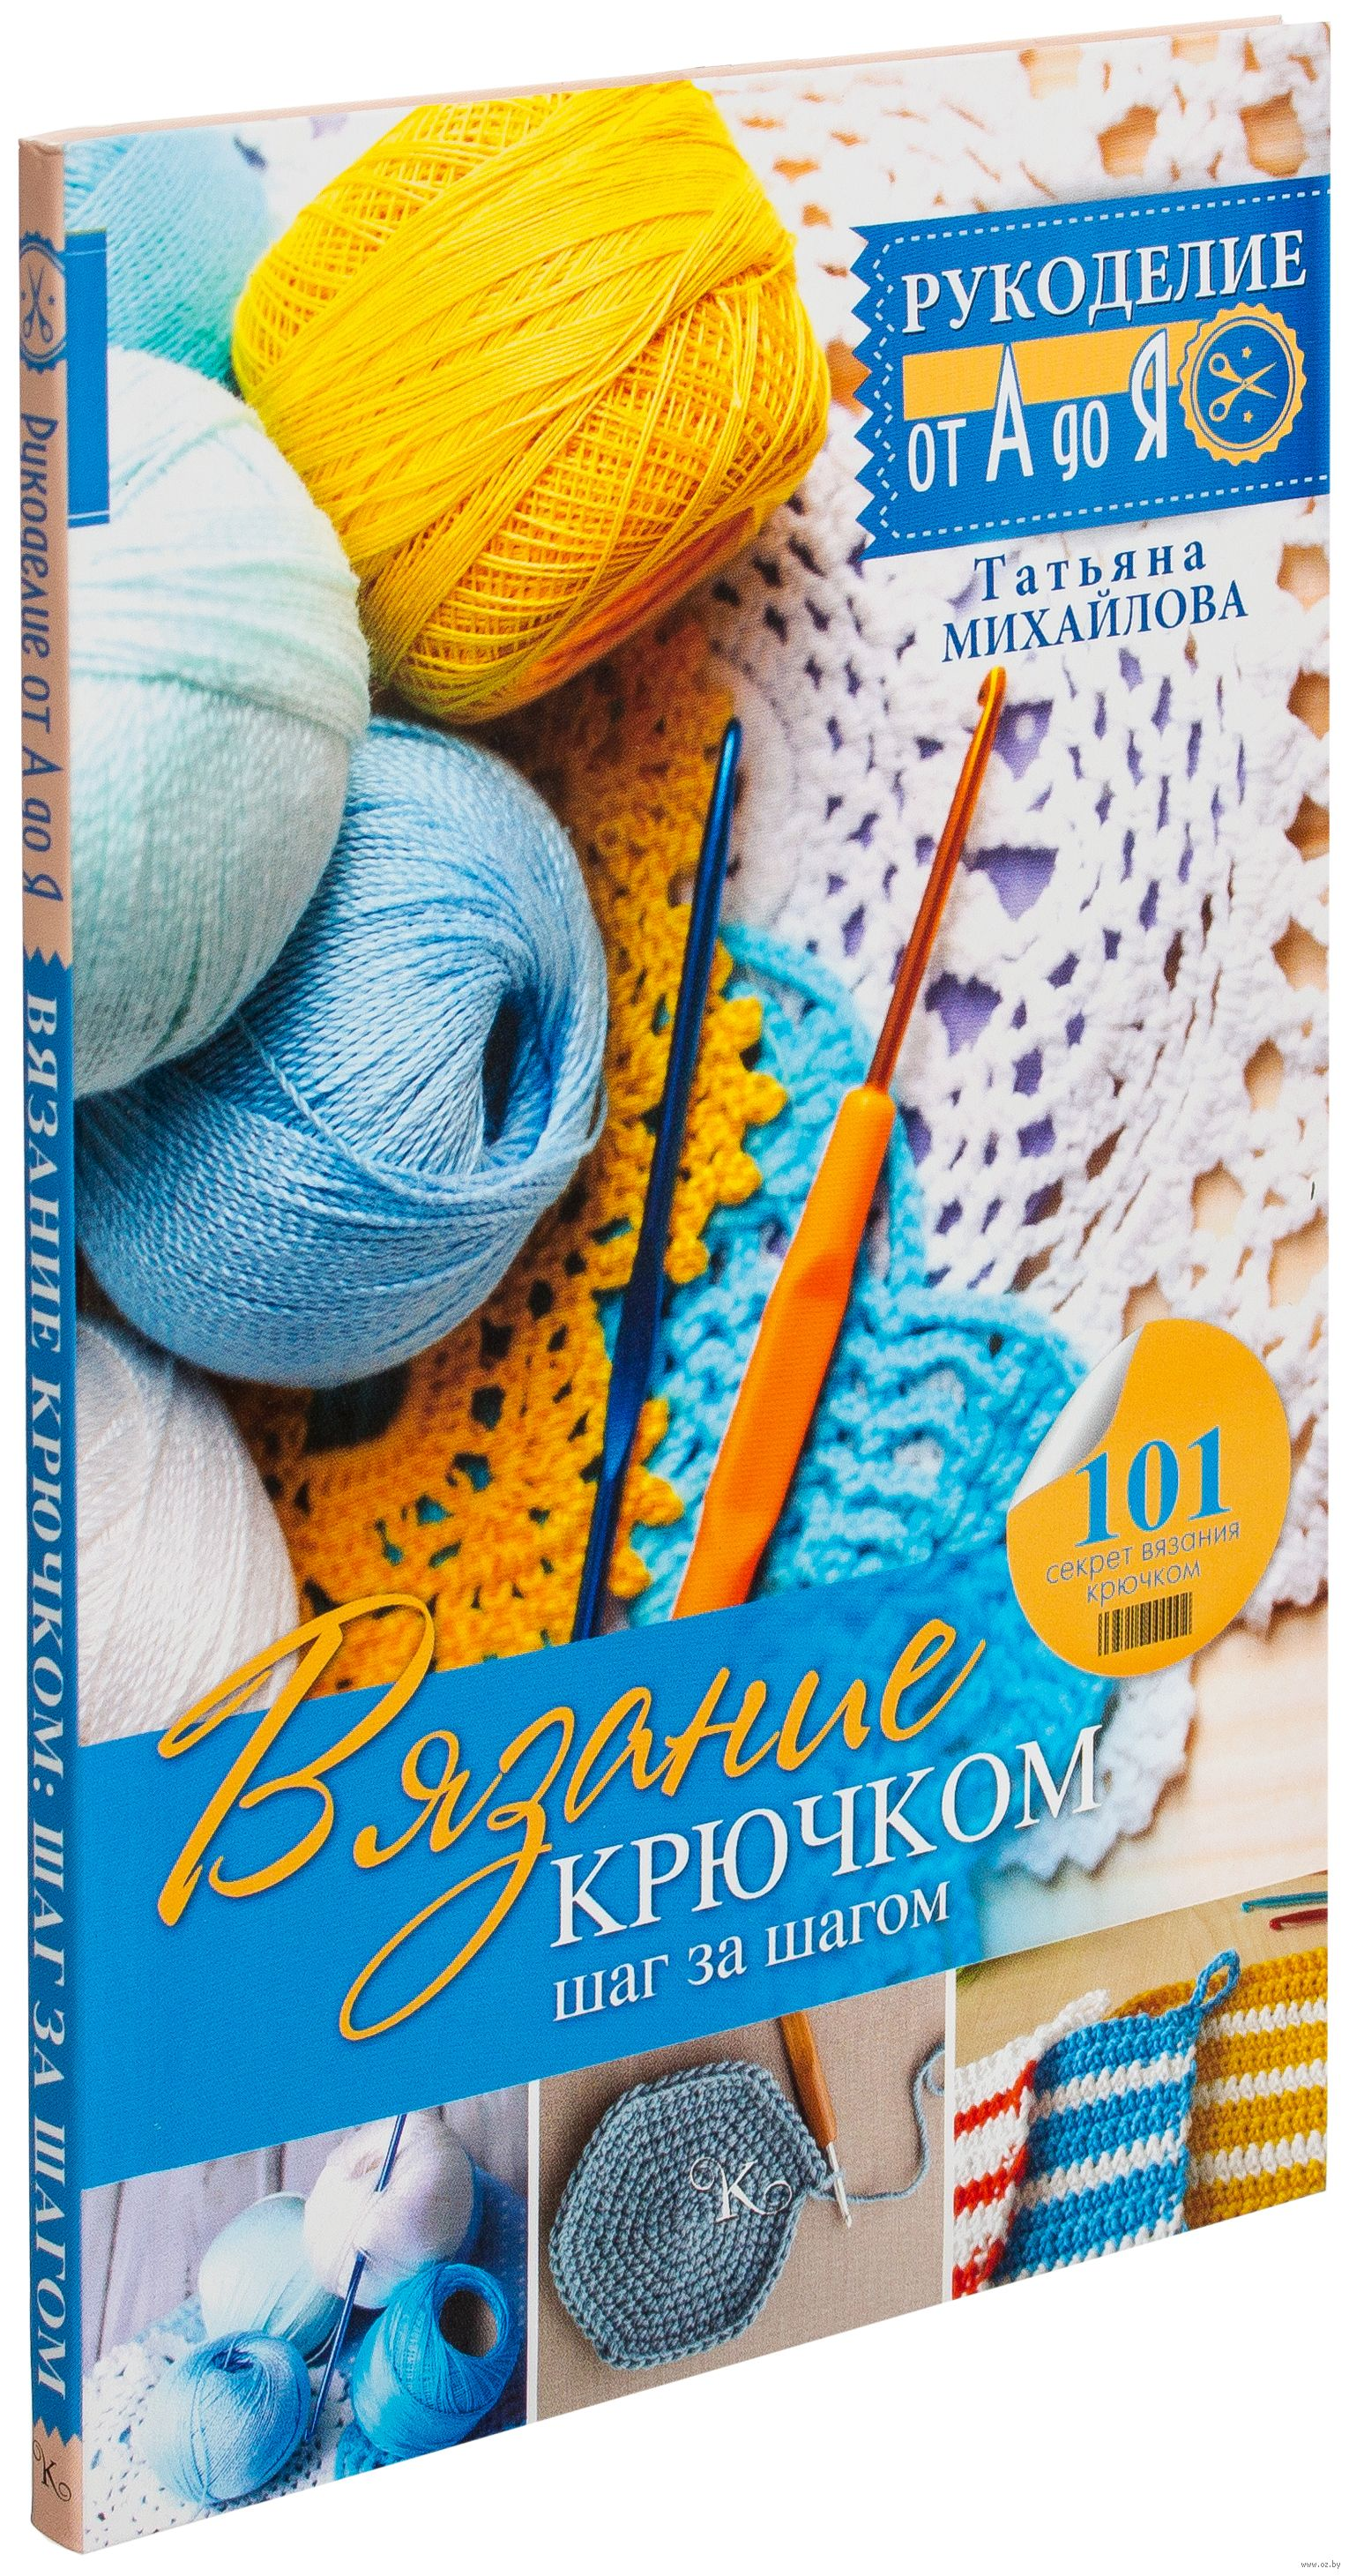 вязание крючком шаг за шагом татьяна михайлова купить книгу